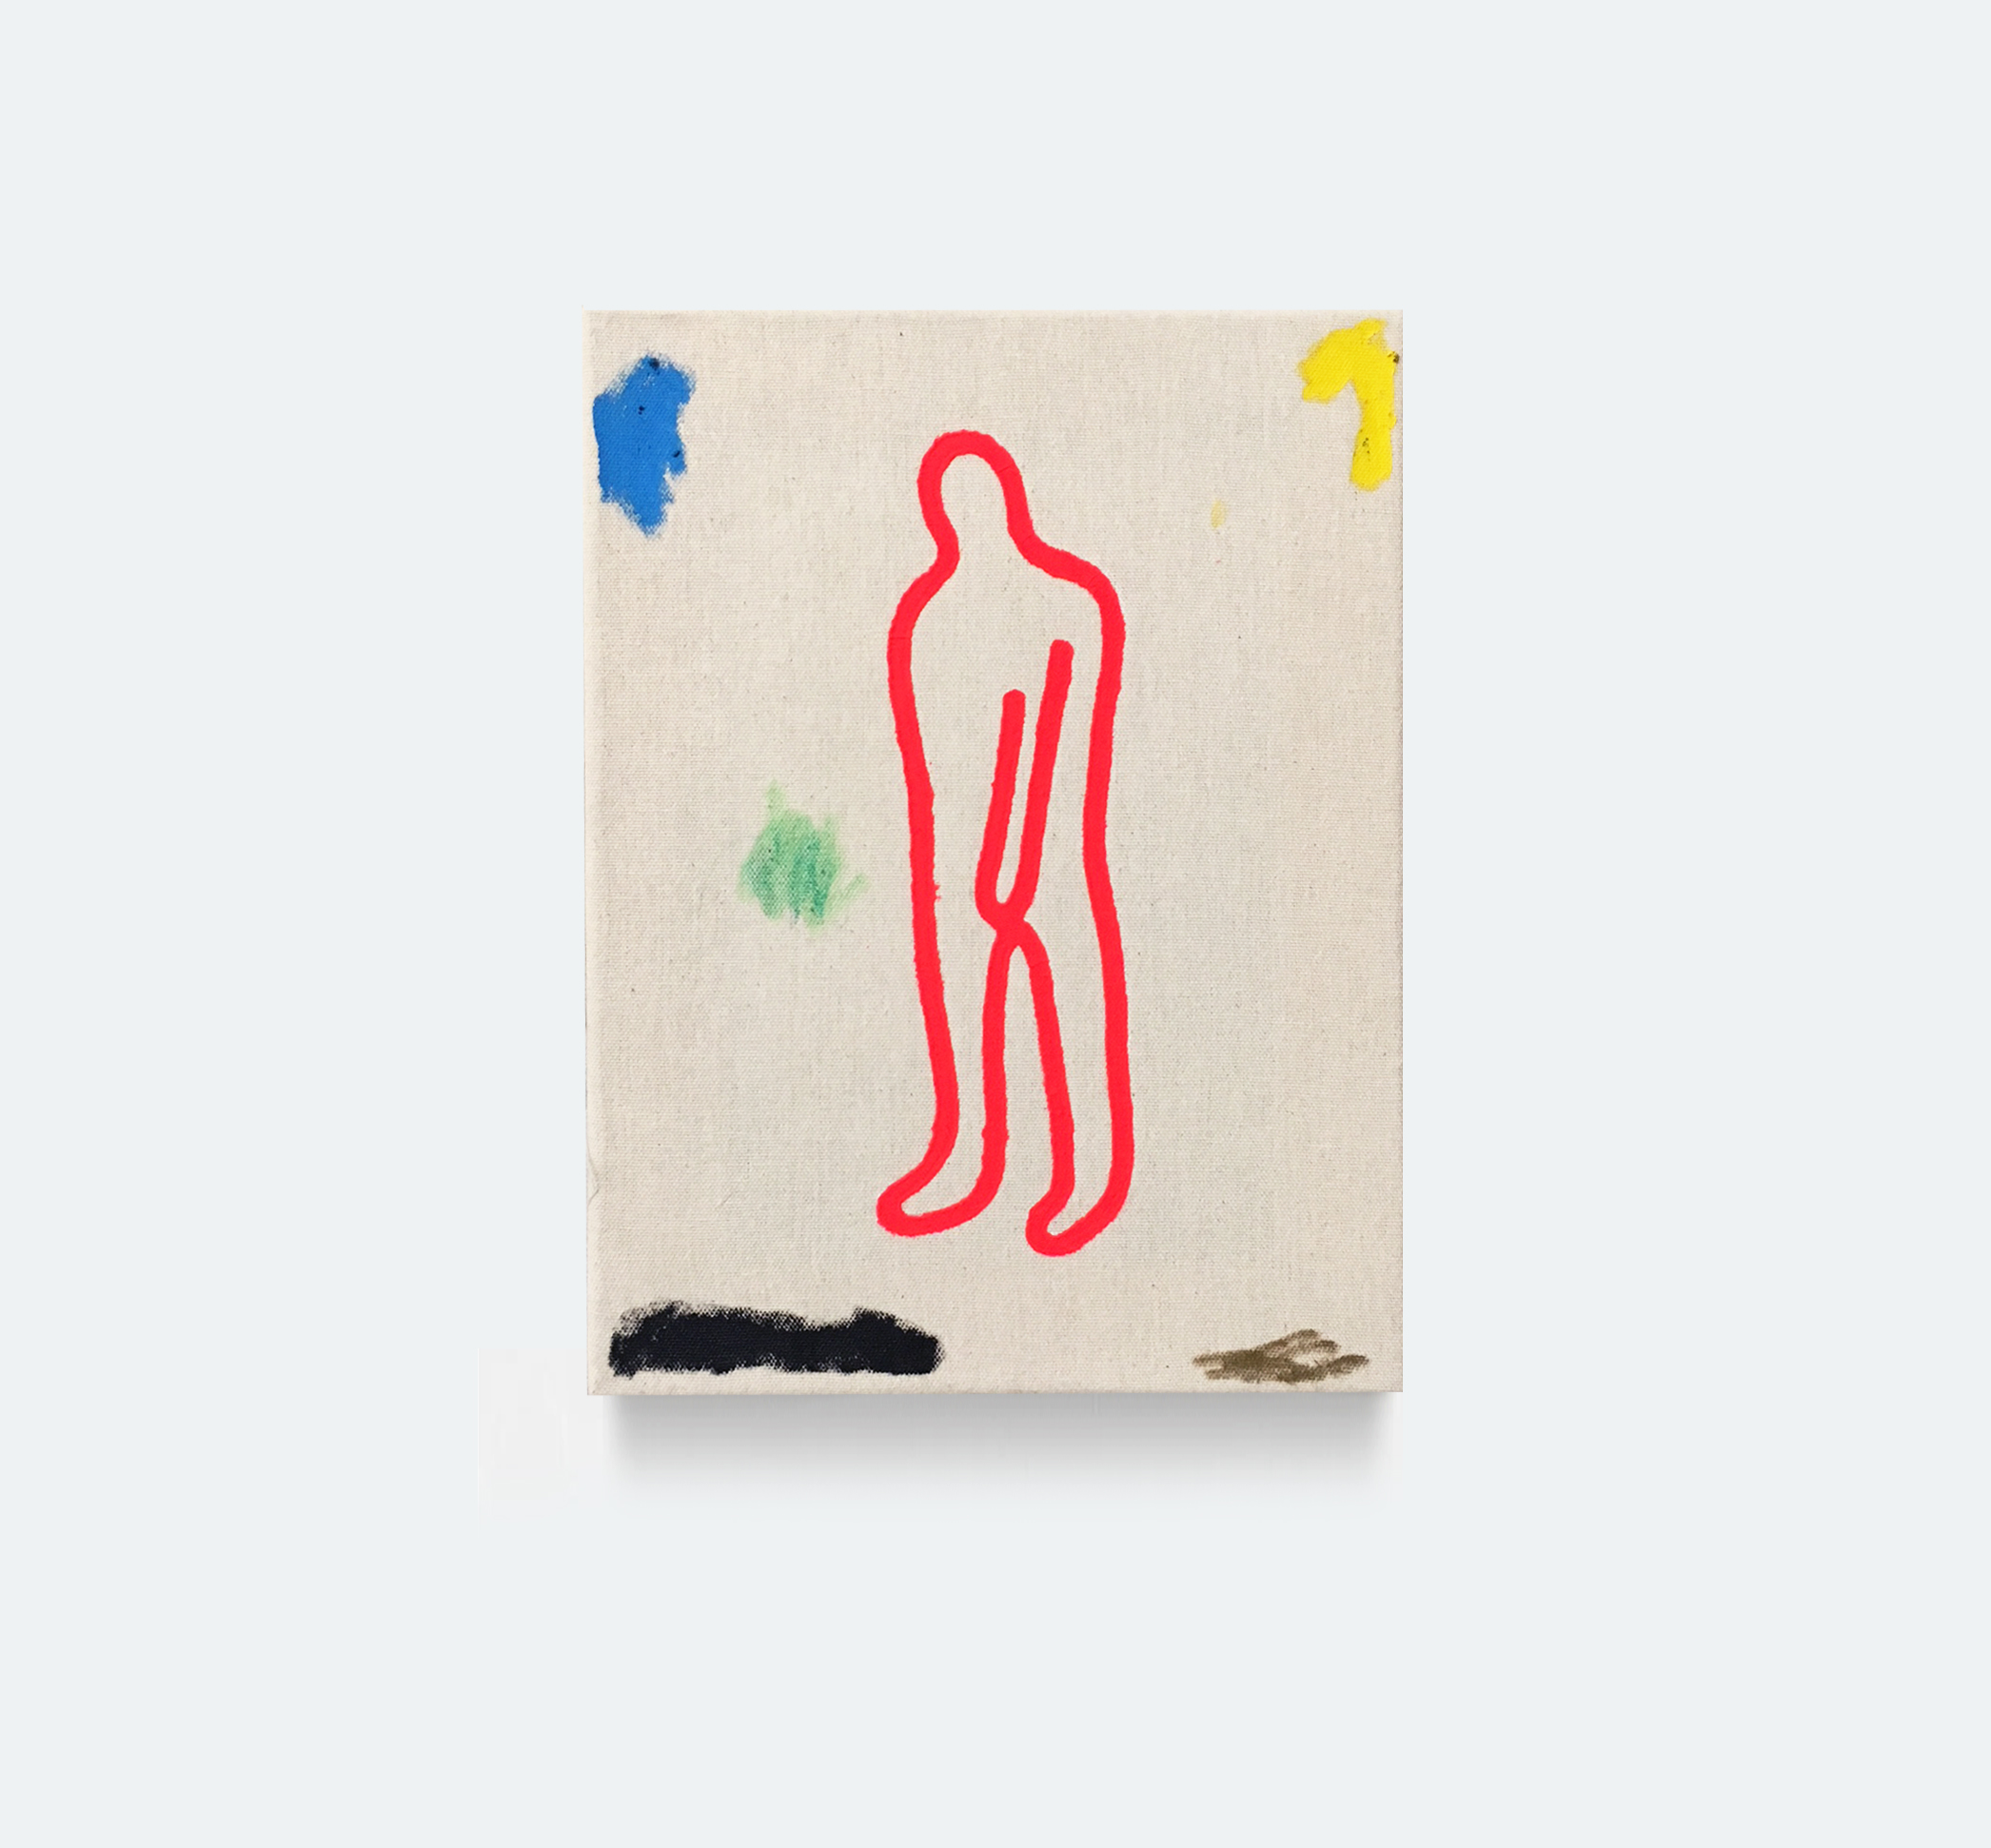 DAN FLANAGAN, Man, 2018, acrylic on canvas, 12 x 9 inches